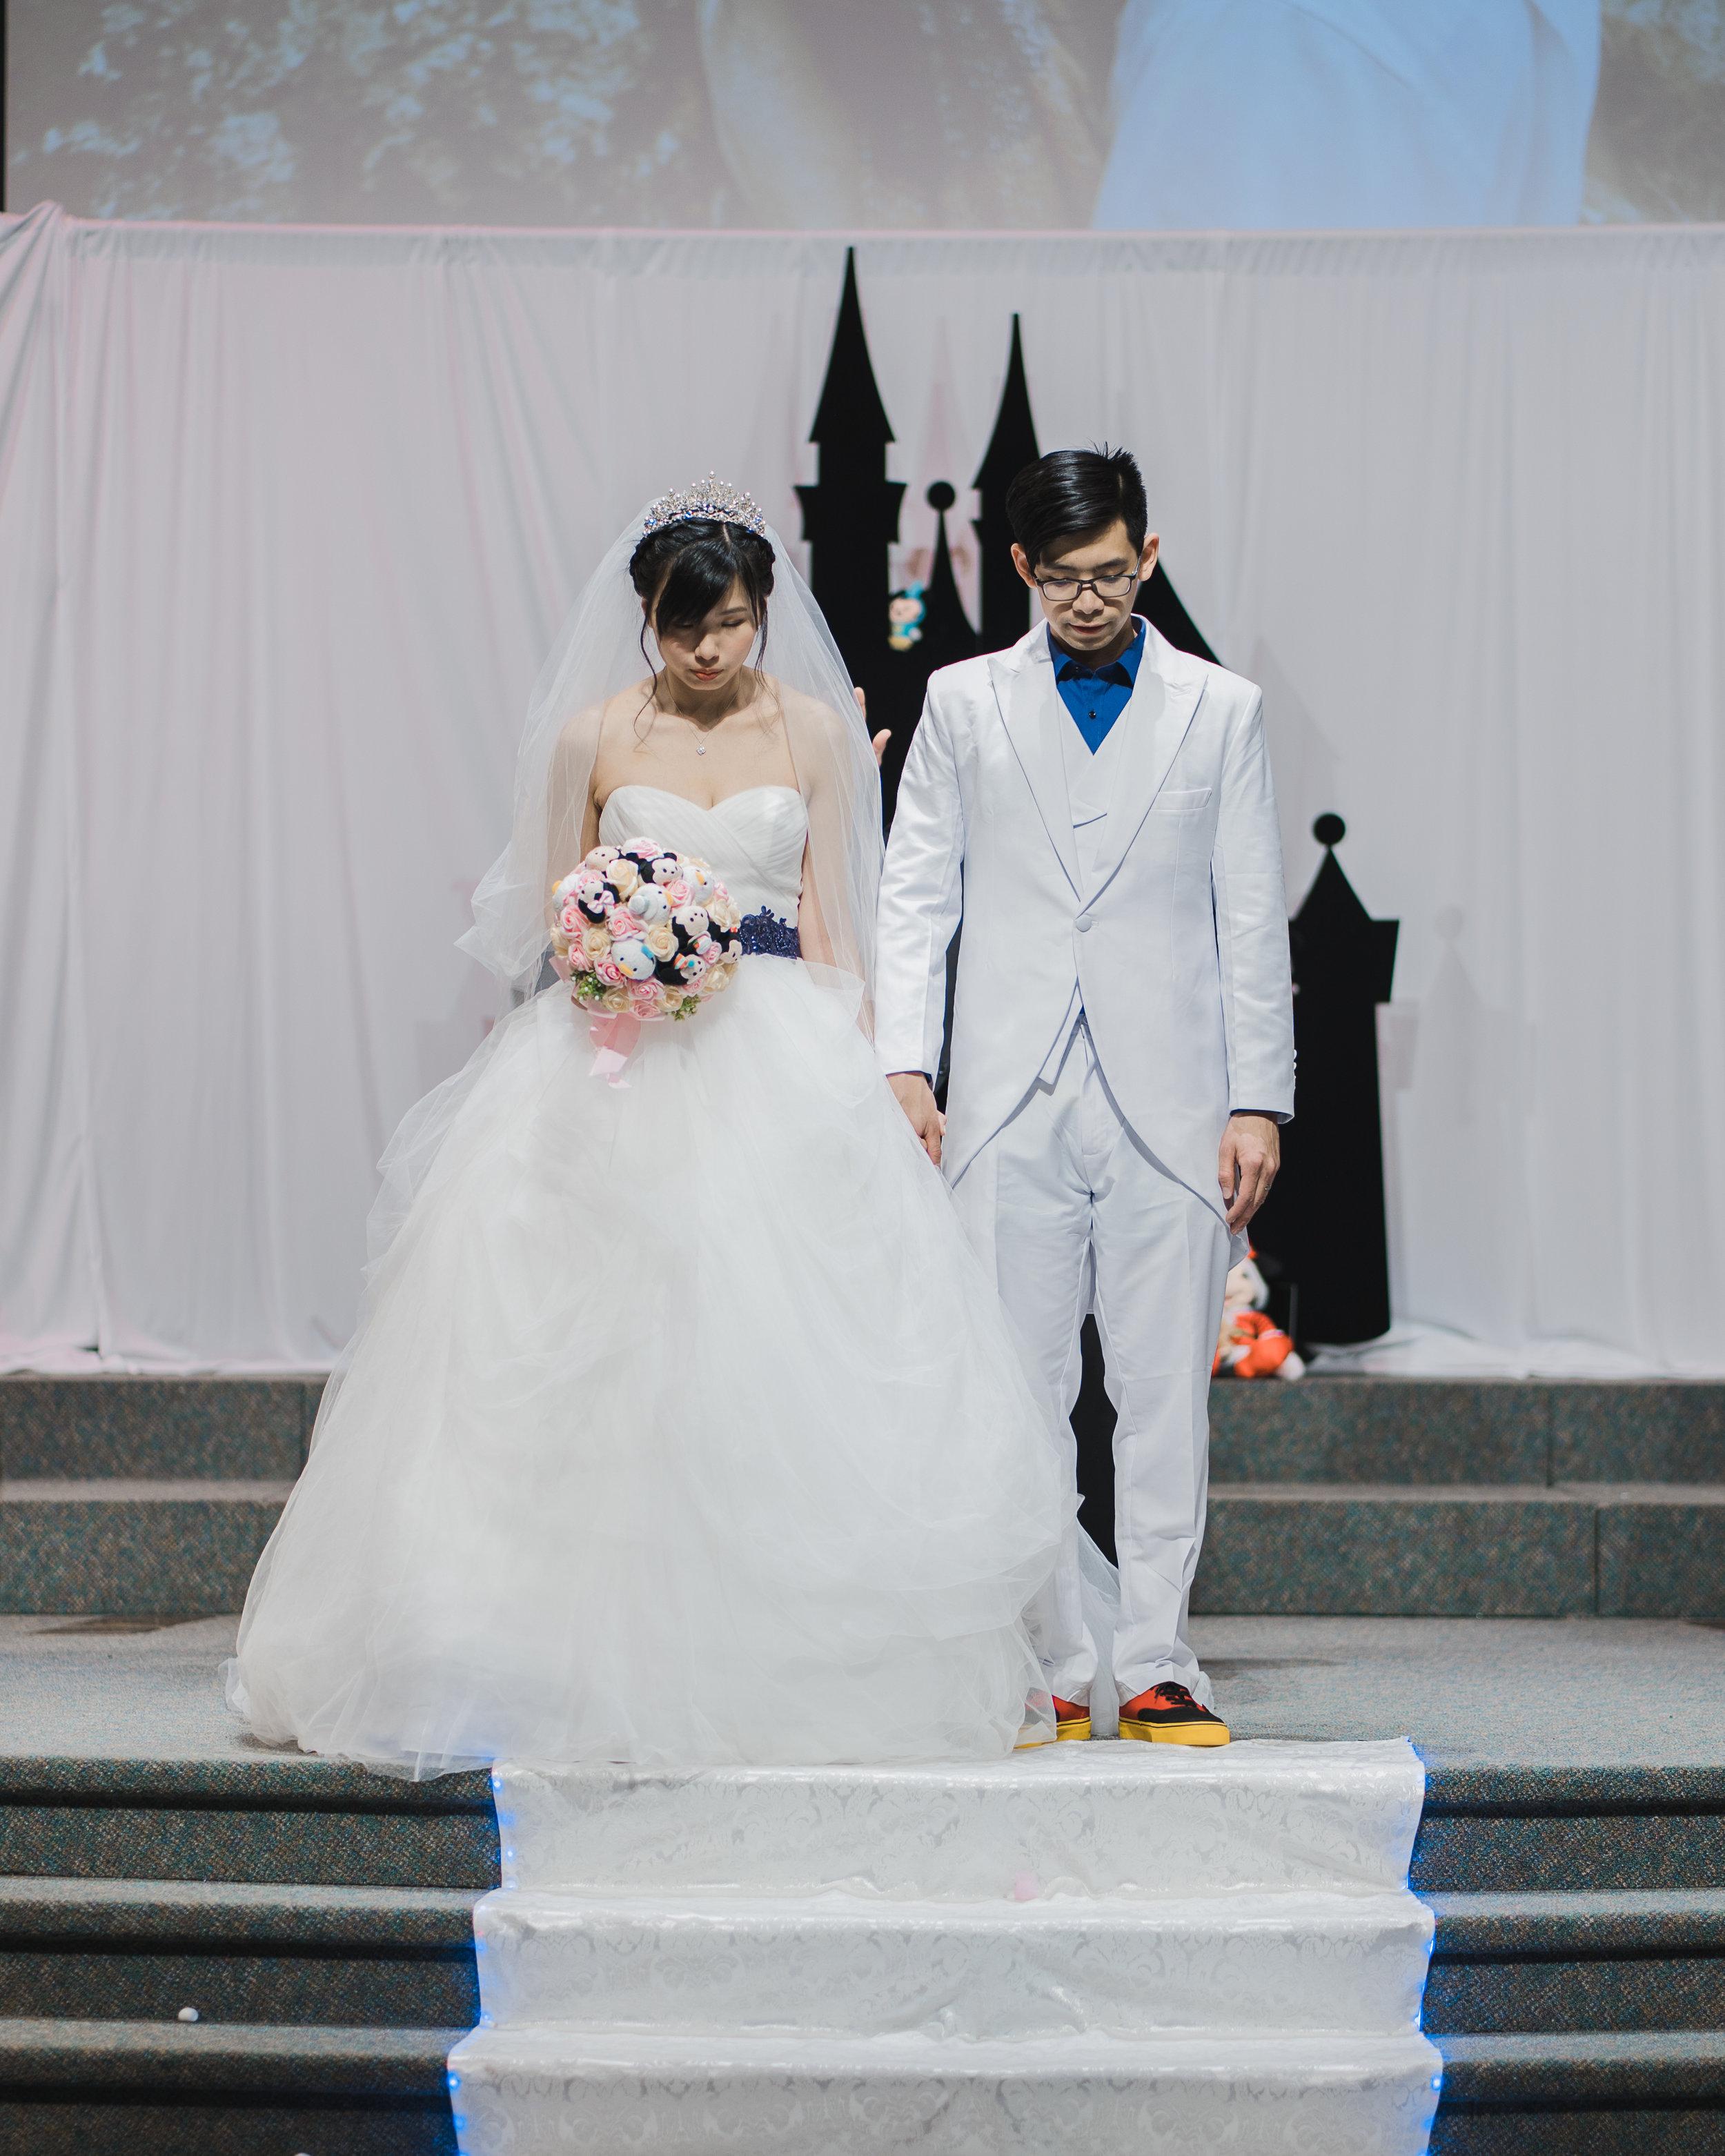 20190520 - Pamela & Matthew Wedding - 0168.jpg